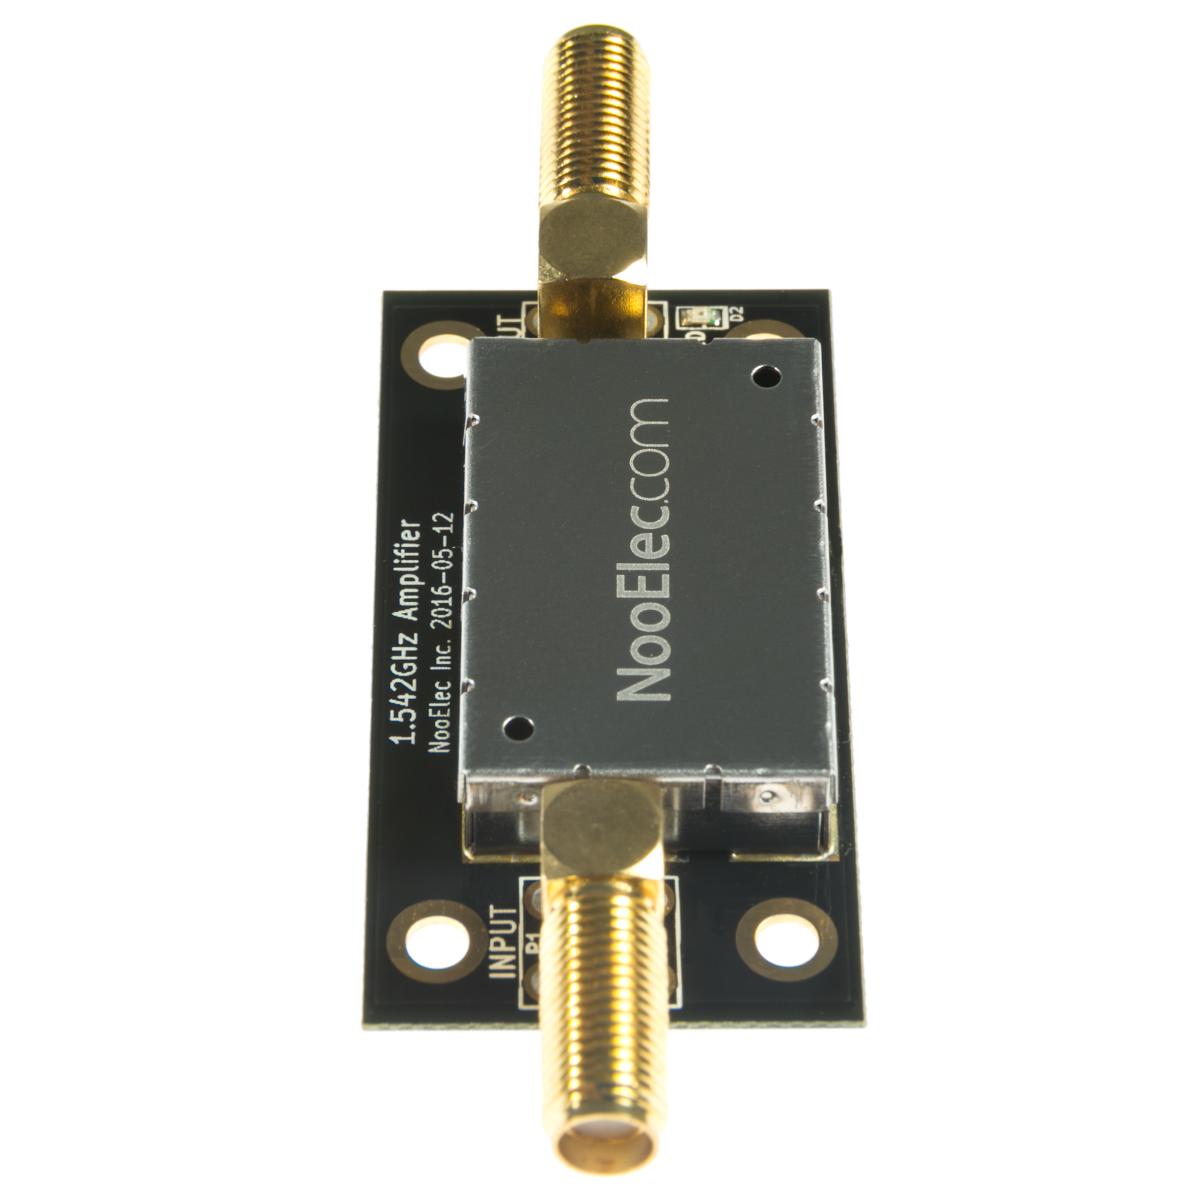 Nooelec SAWbird iO Barebones - Premium Dual Ultra-Low Noise Amplifier (LNA)  & SAW Filter Module for L-Band (Inmarsat AERO/STD-C) Applications  1542MHz